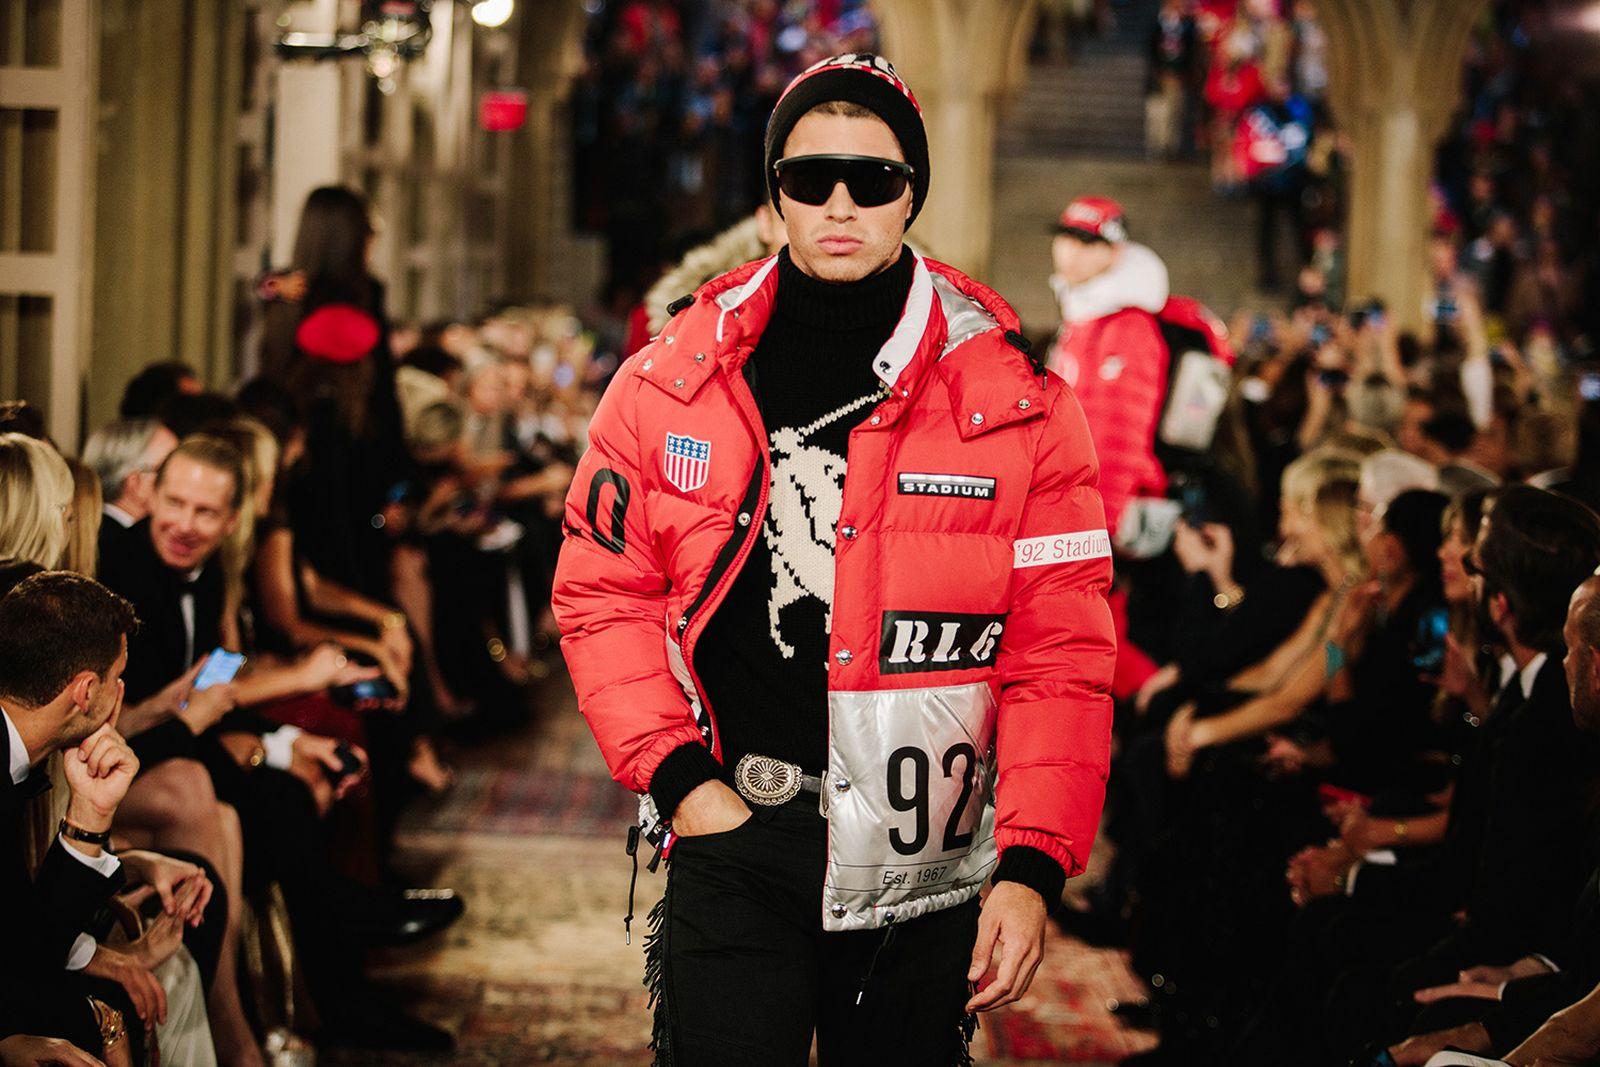 Ralph Lauren Fall Winter 2019 NYFW fashion shows lo life new york fashion week